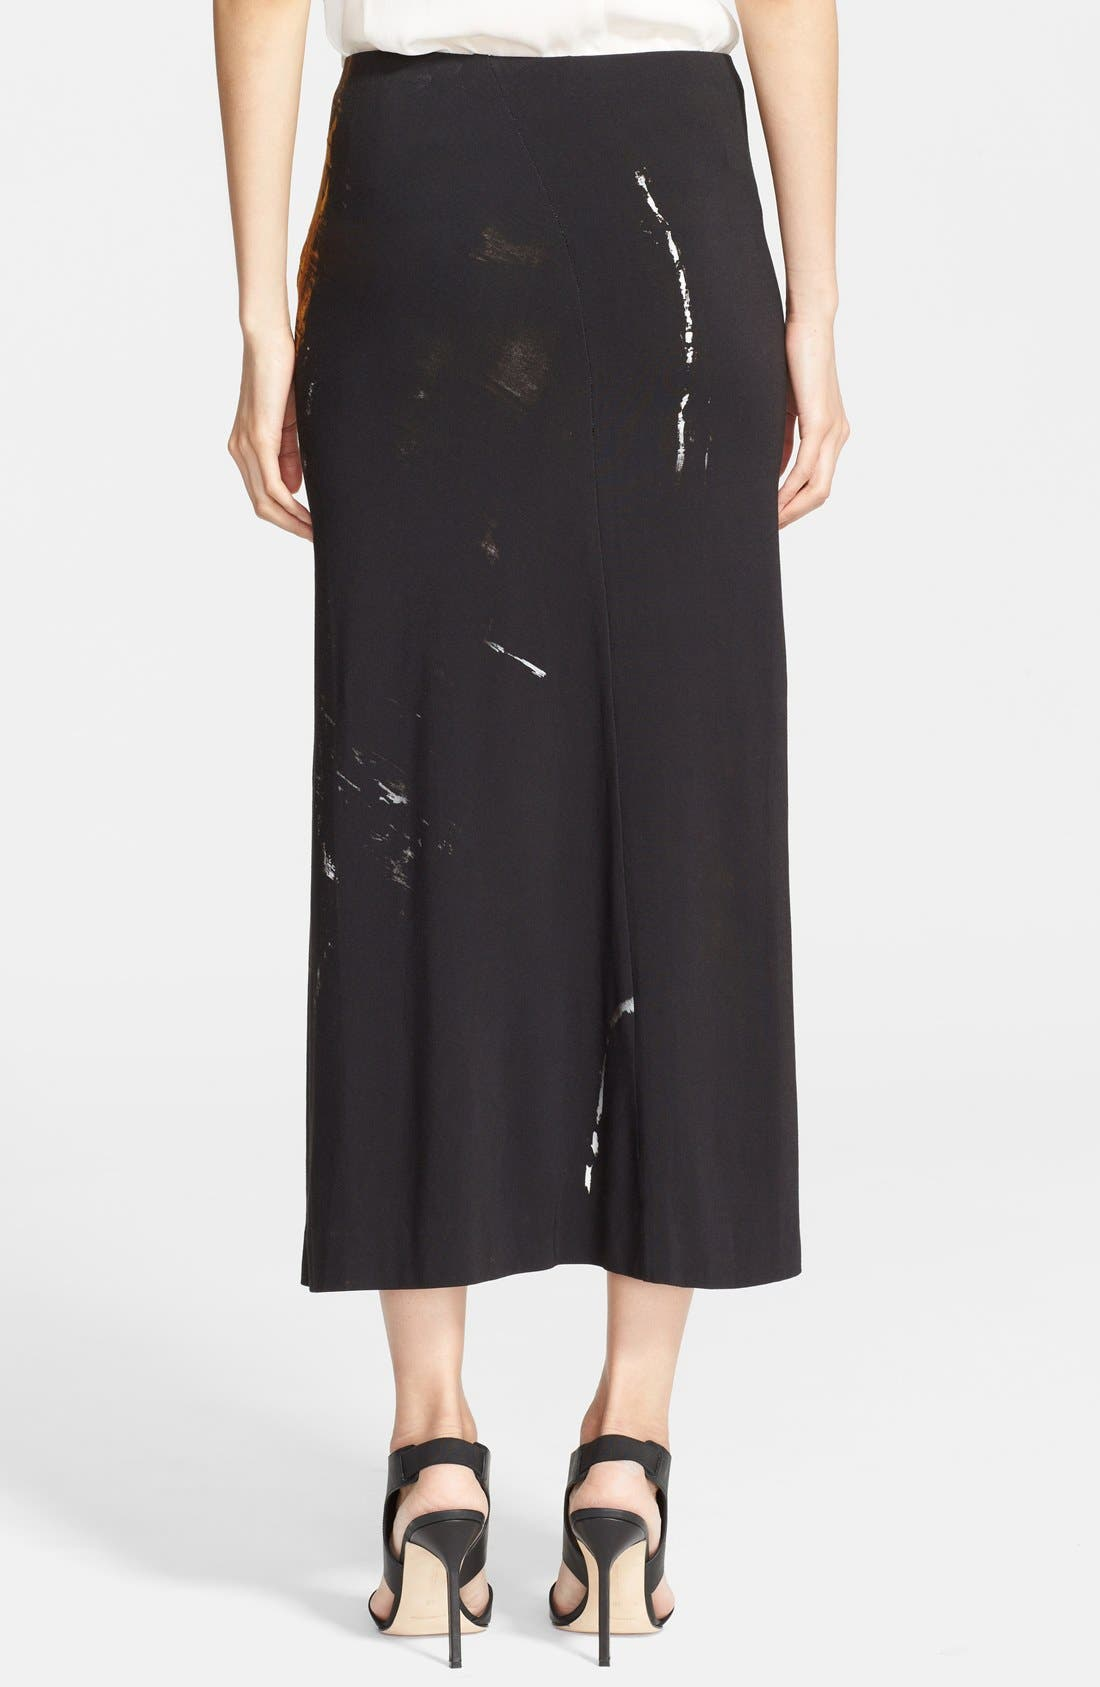 Donna Karan Collection 'Raku Brushstroke' Jersey Skirt,                             Alternate thumbnail 3, color,                             019